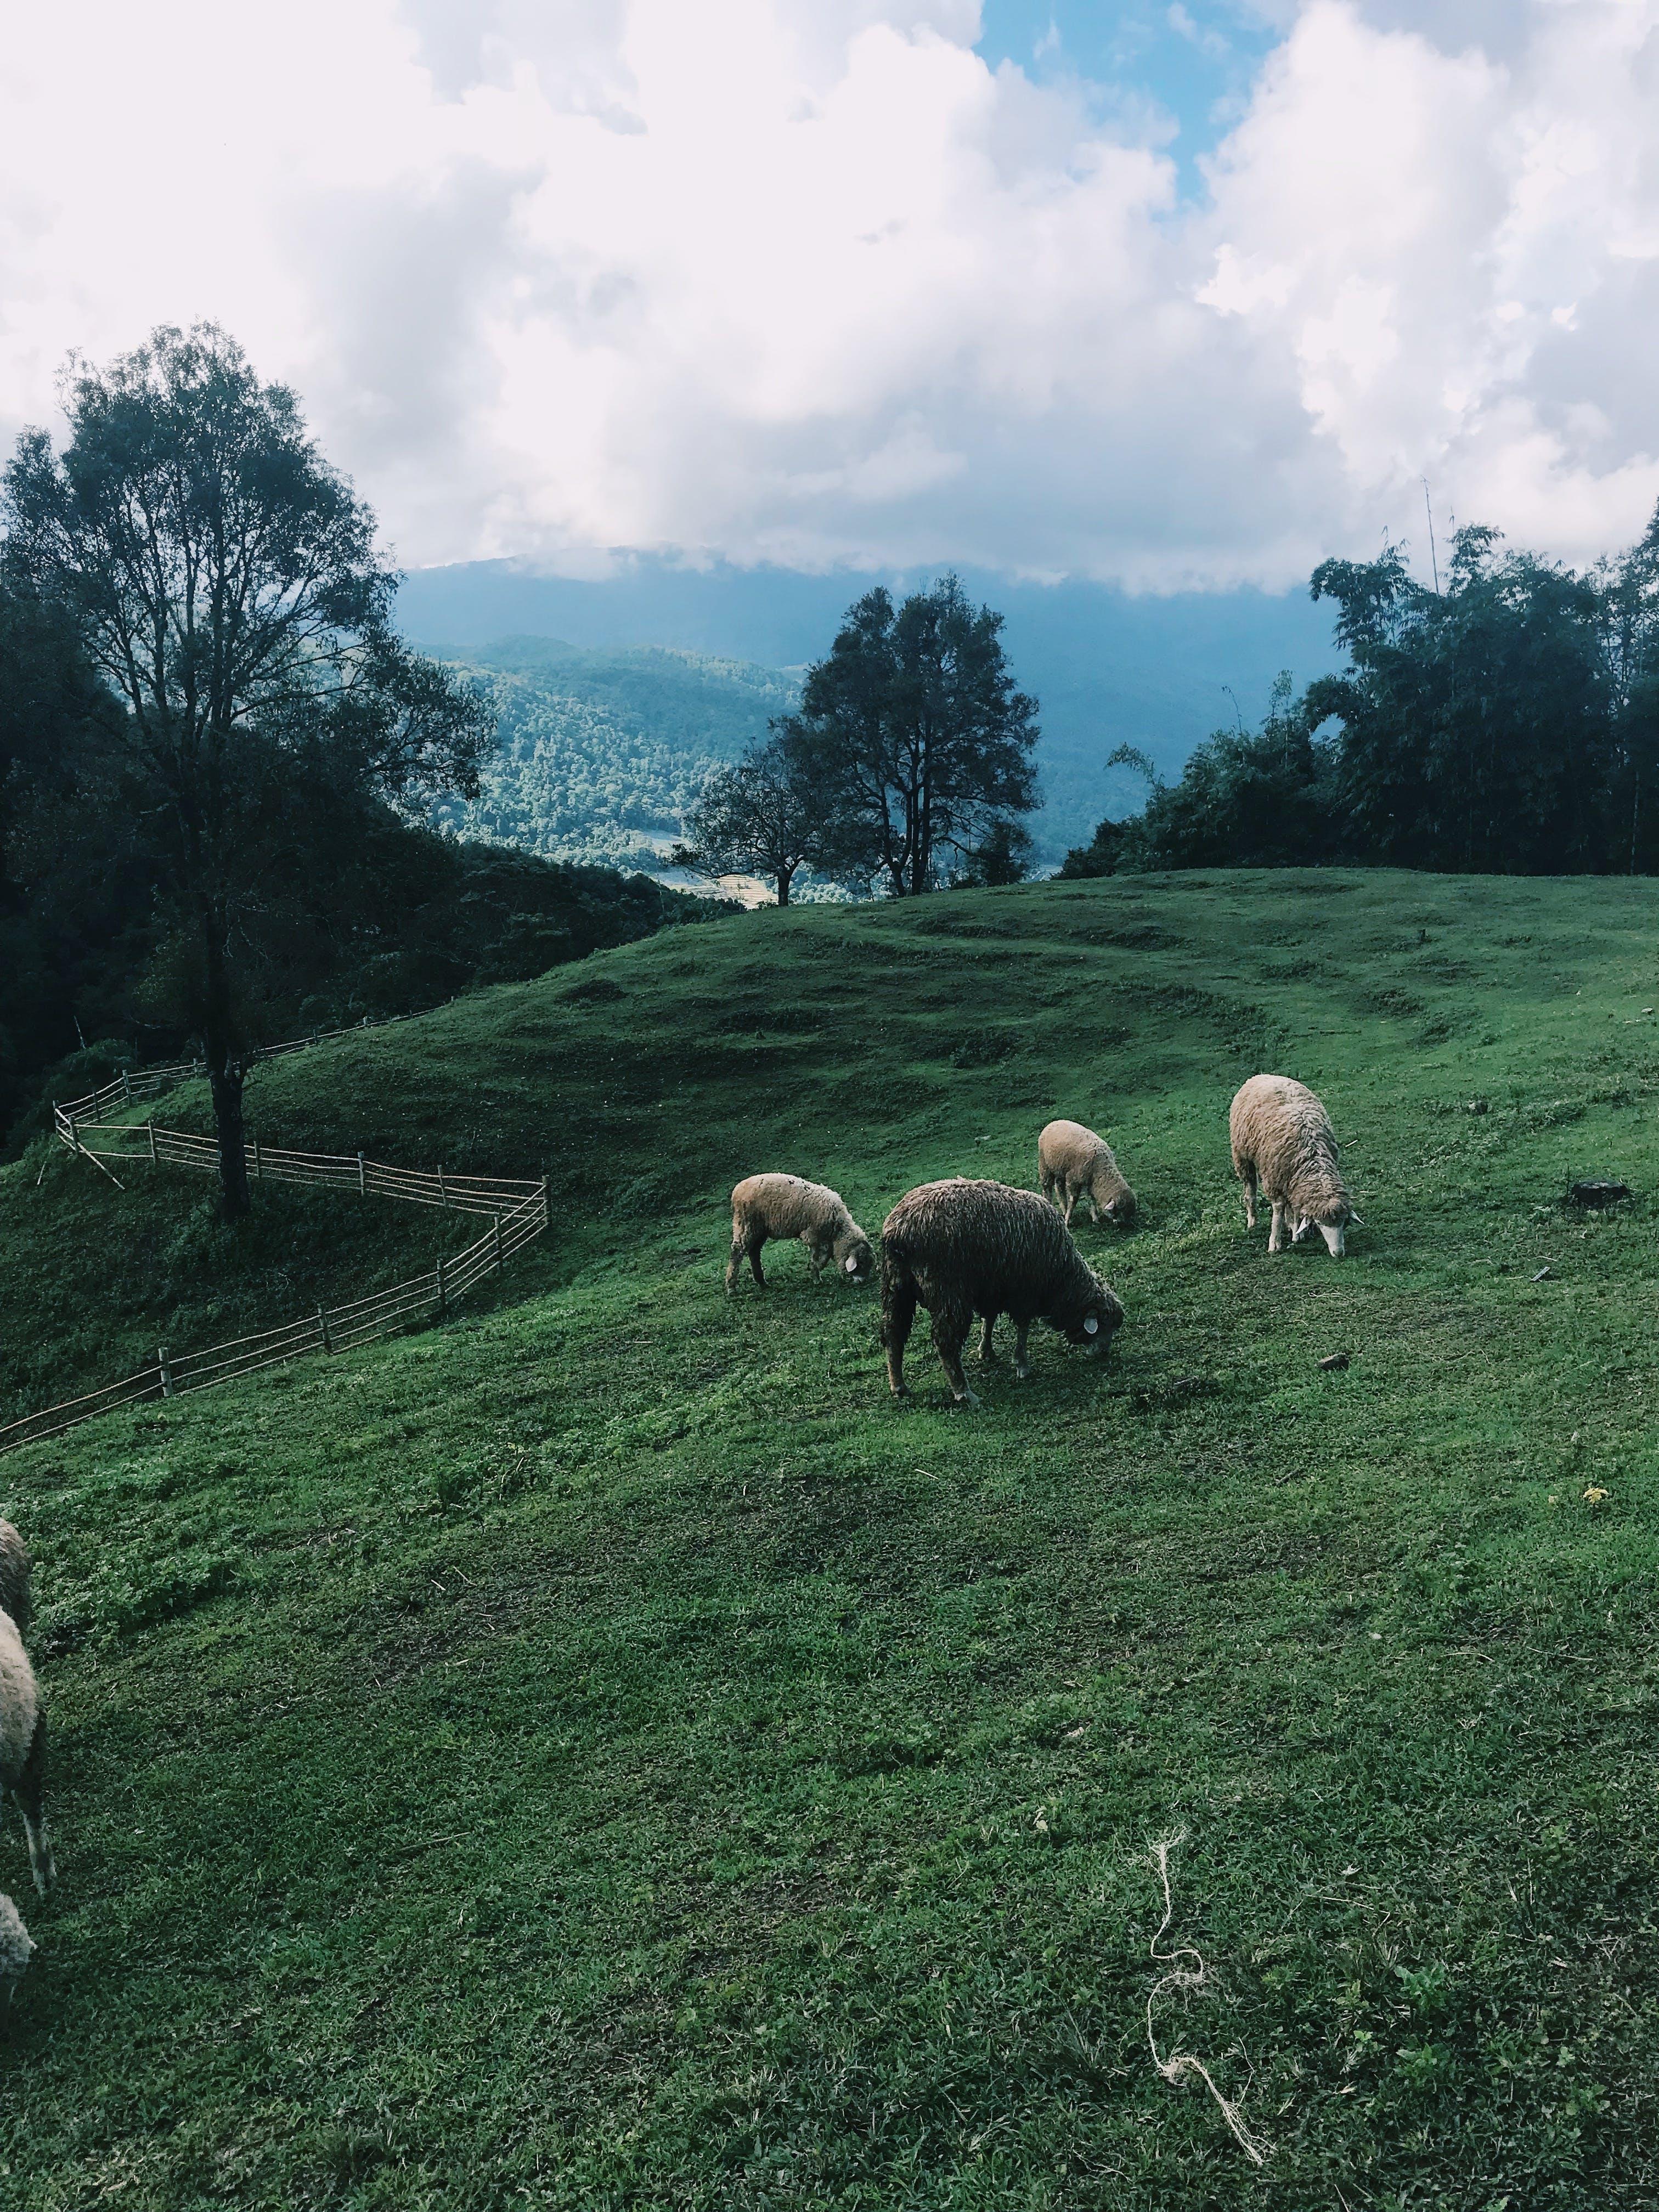 Free stock photo of #chiangmai #mountain #nature #sheep #chubby #doi #